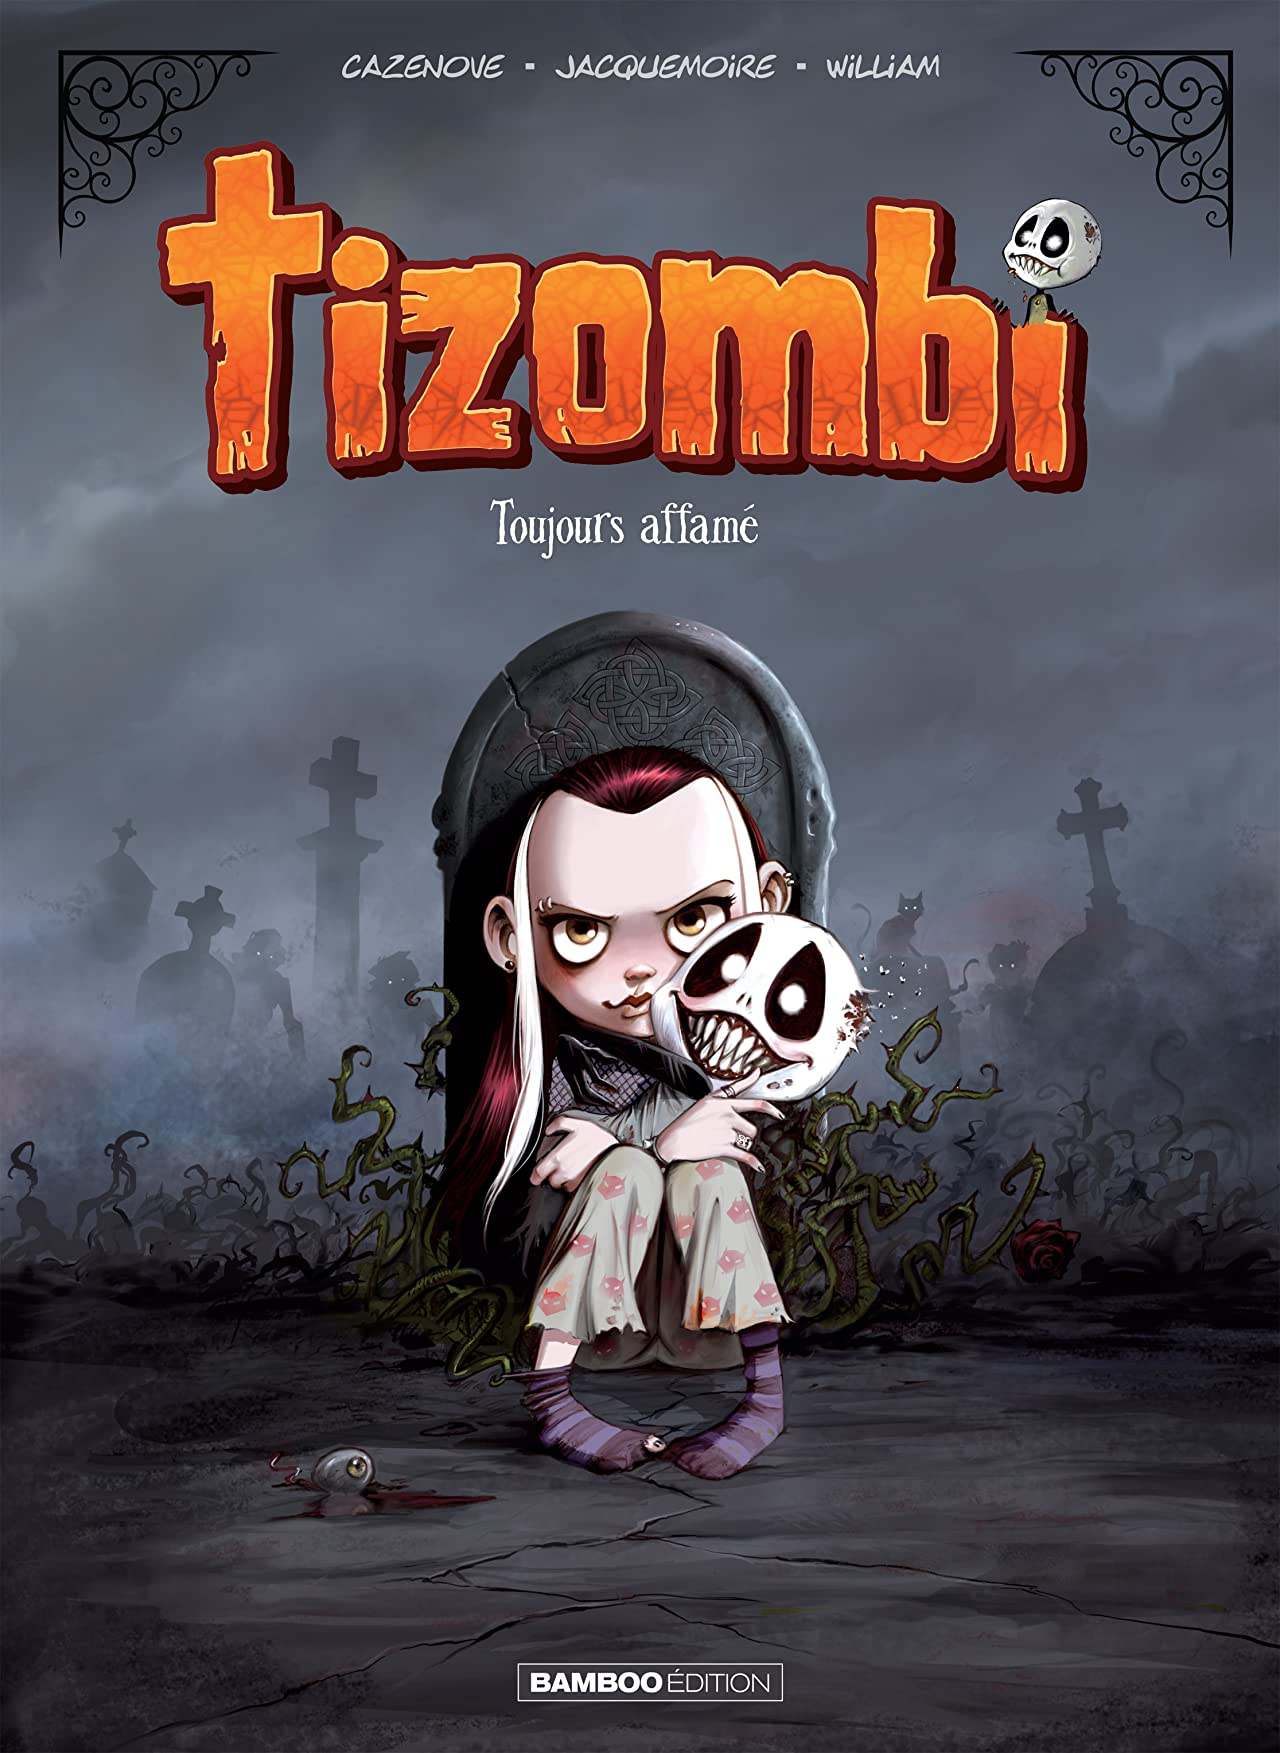 Tizombi Vol. 1: Toujours affamé